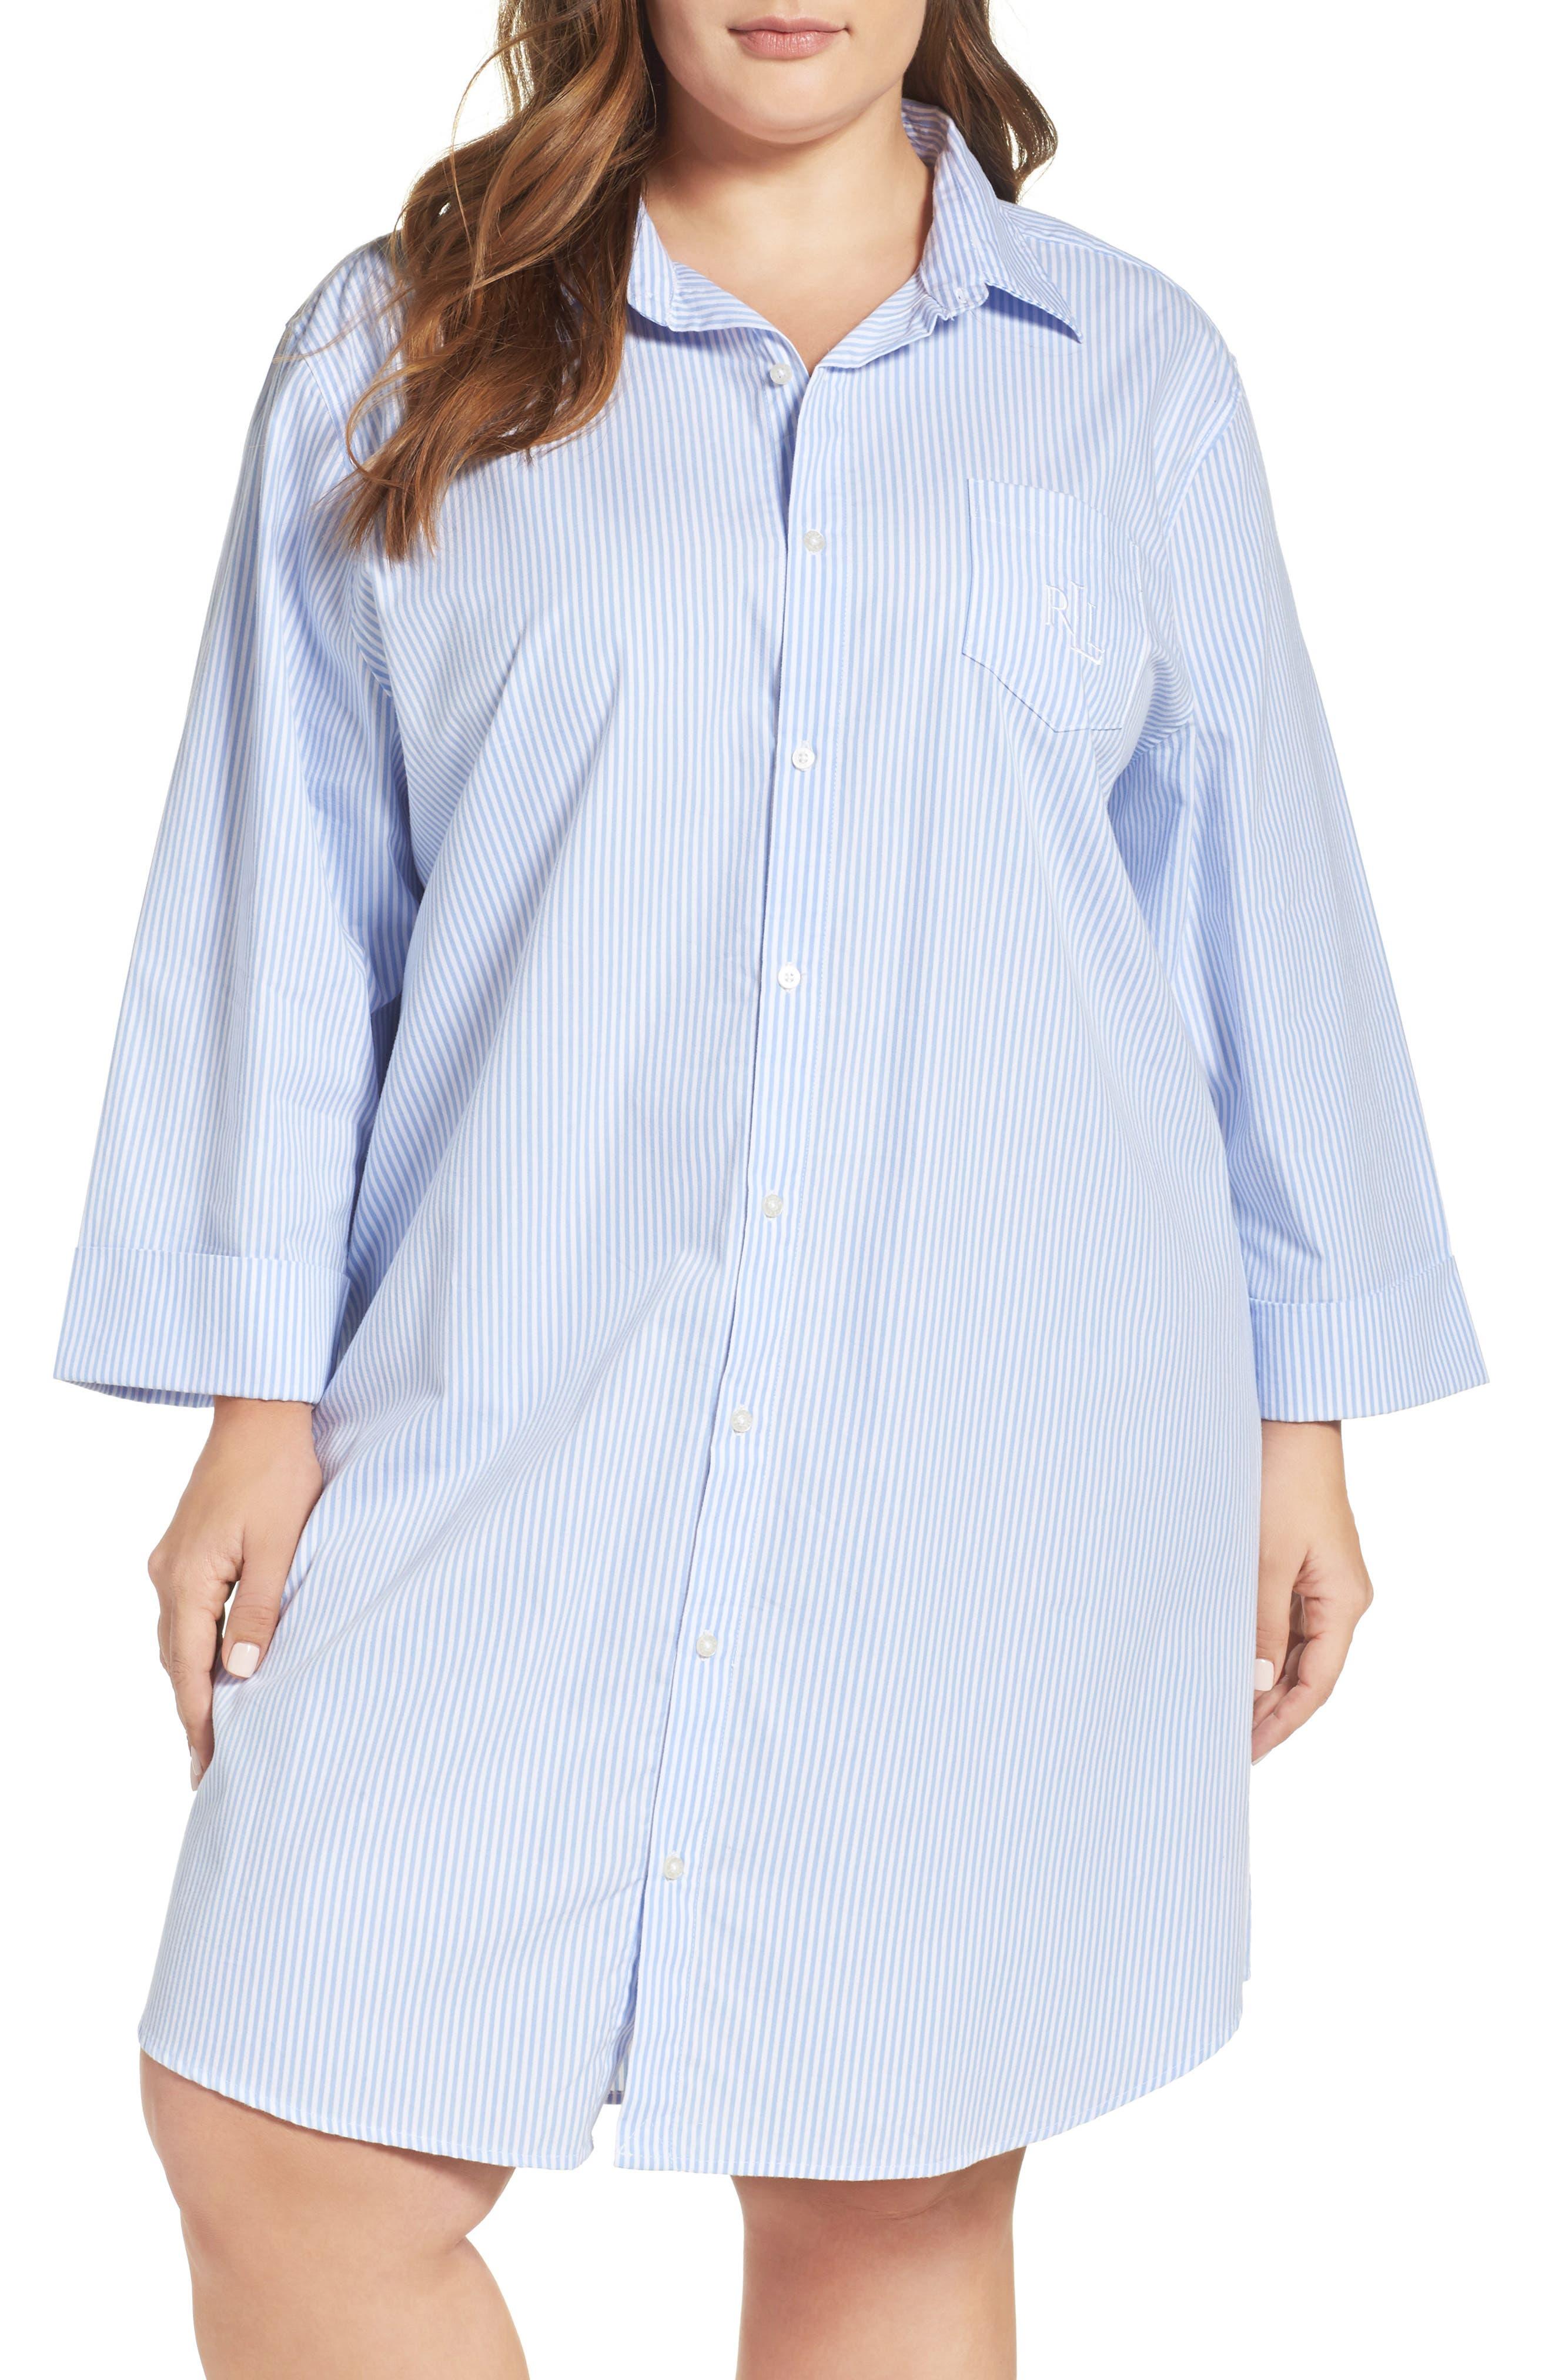 Sleep Shirt,                             Main thumbnail 1, color,                             Stripe French Blue/ White